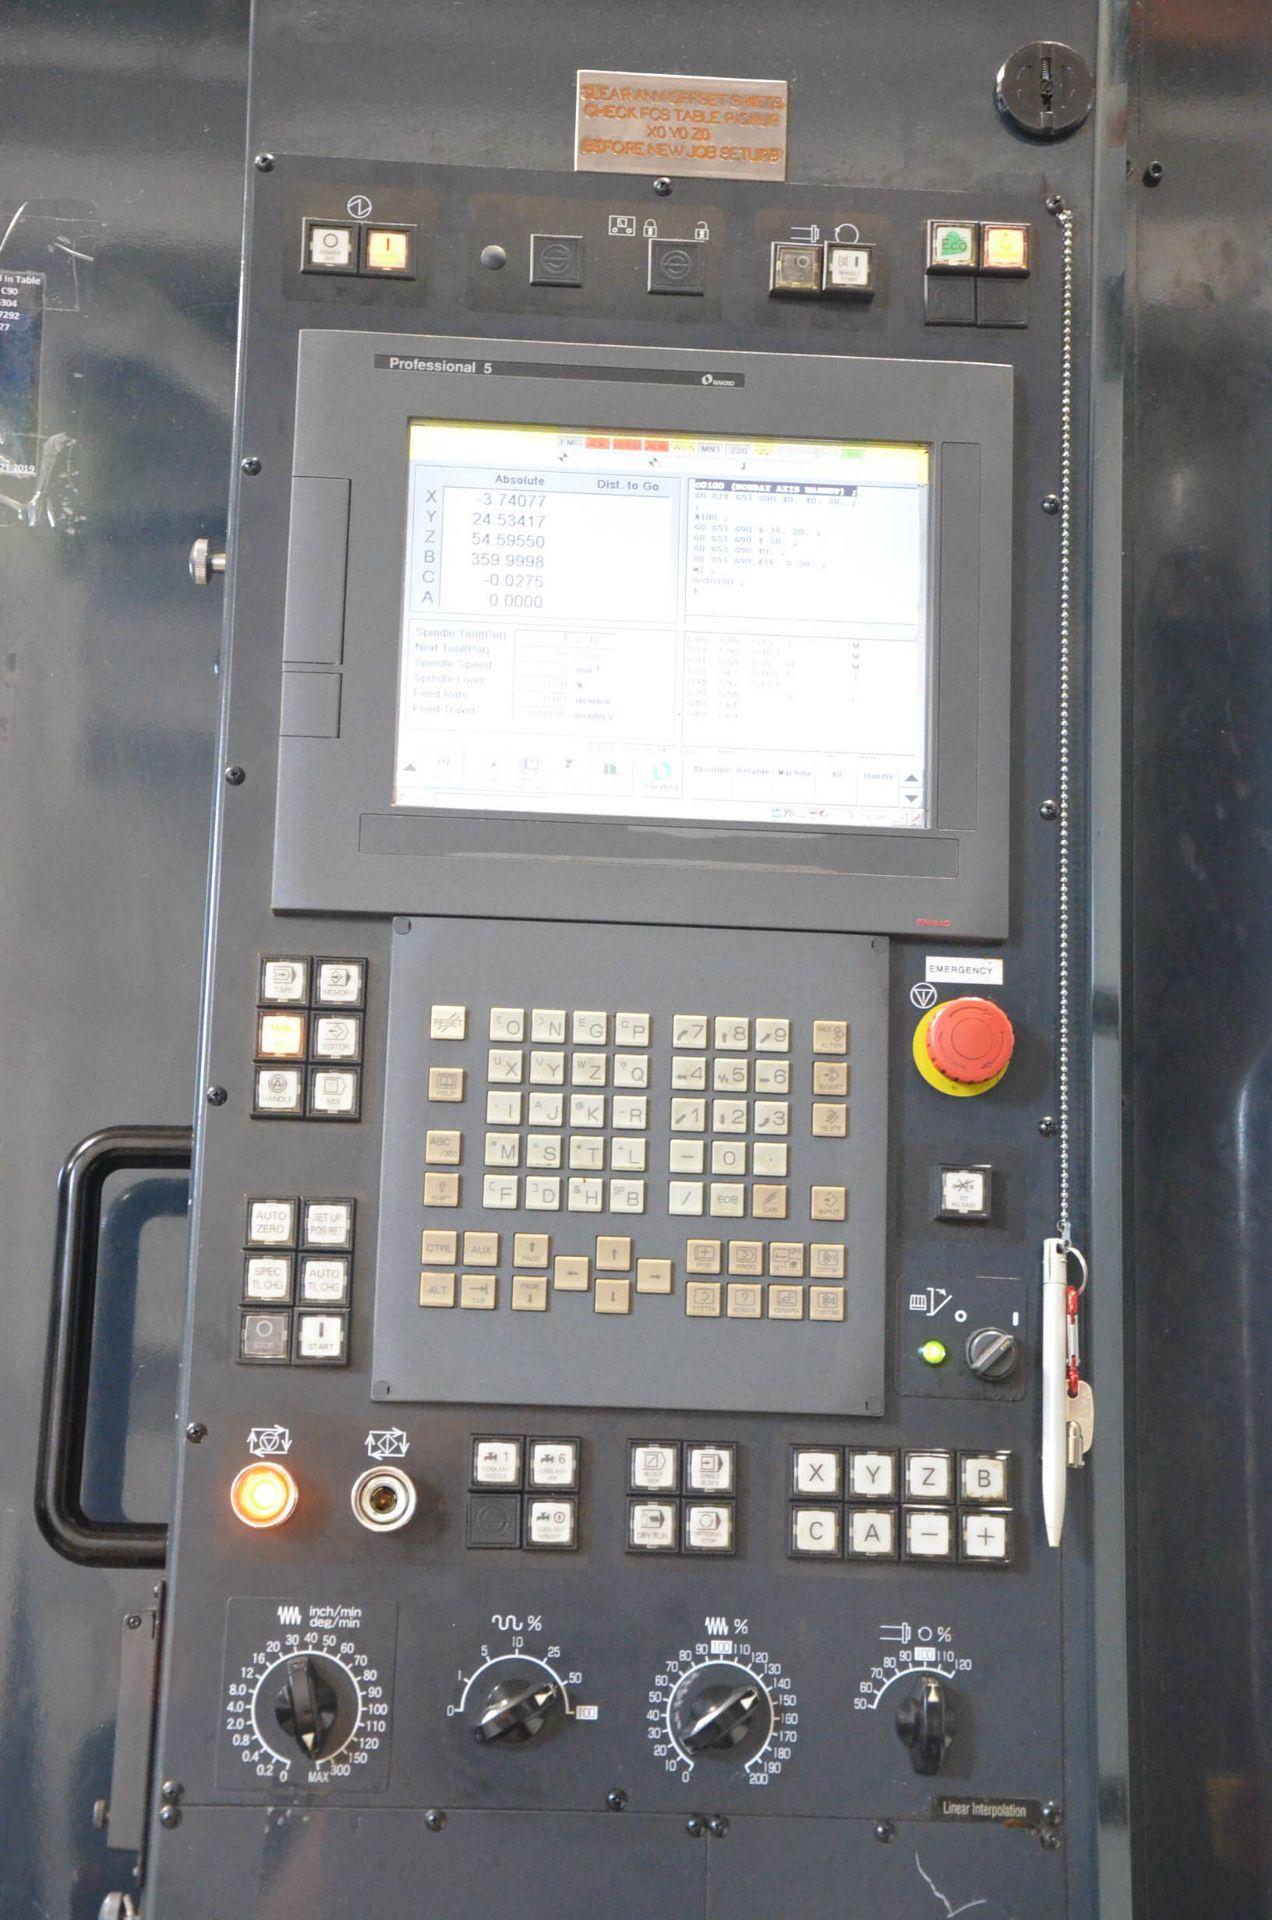 "MAKINO (2013) MCC2013 VG 6-AXIS CNC MACHINING CENTER WITH MAKINO PROFESSIONAL 5 CNC CONTROL, 59"" X - Image 8 of 11"